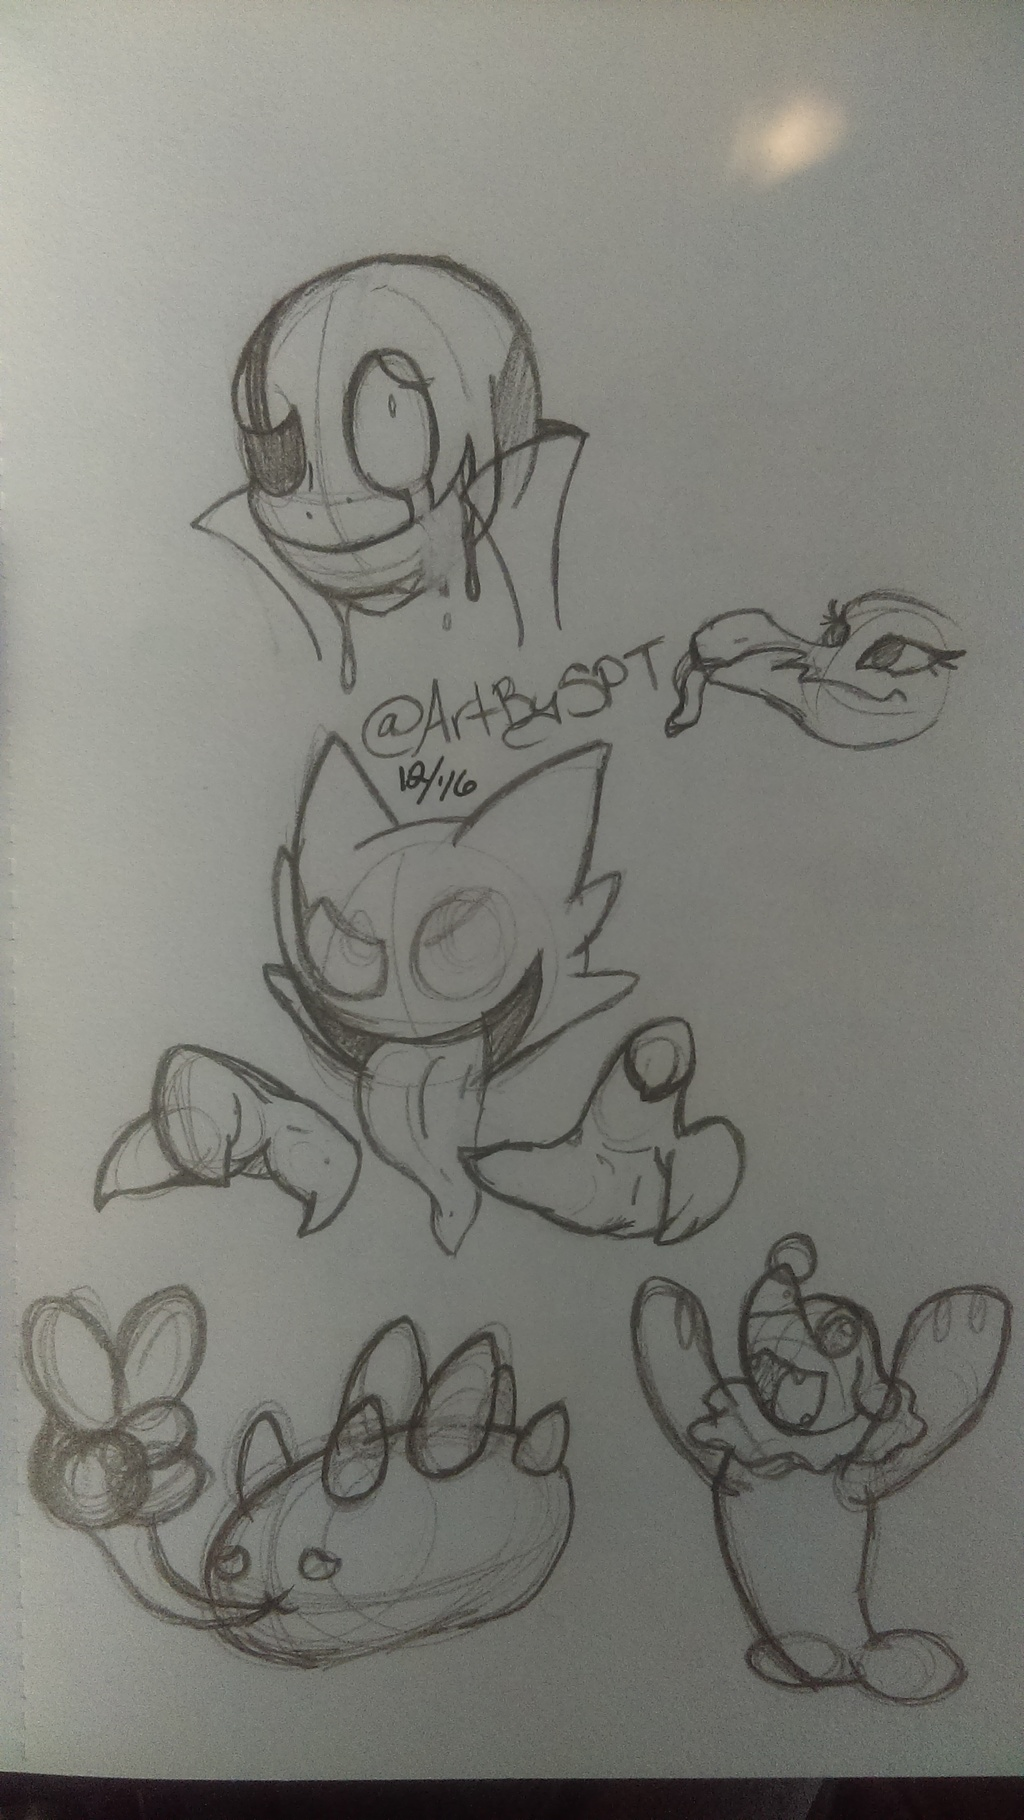 Sketchbook doodles-random assortment